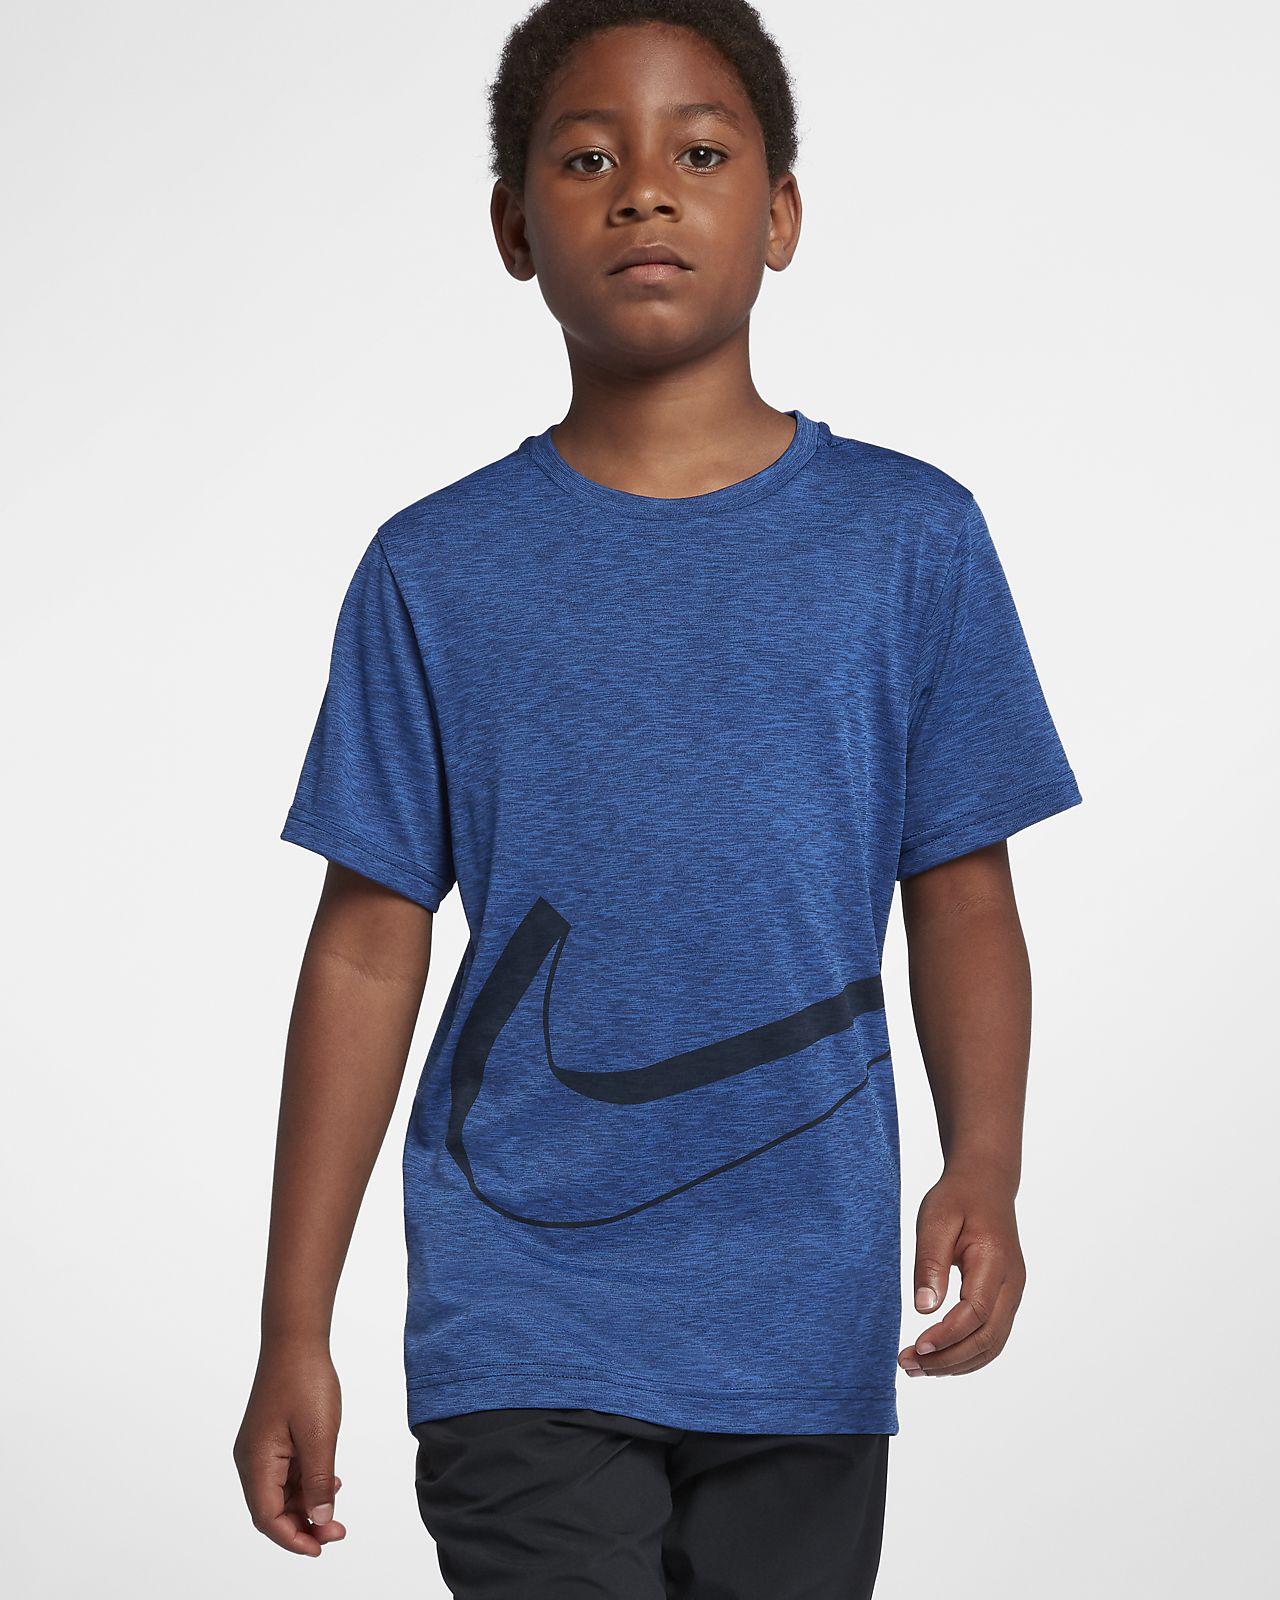 Футболка для тренинга с коротким рукавом для мальчиков школьного возраста Nike Dri-FIT Breathe